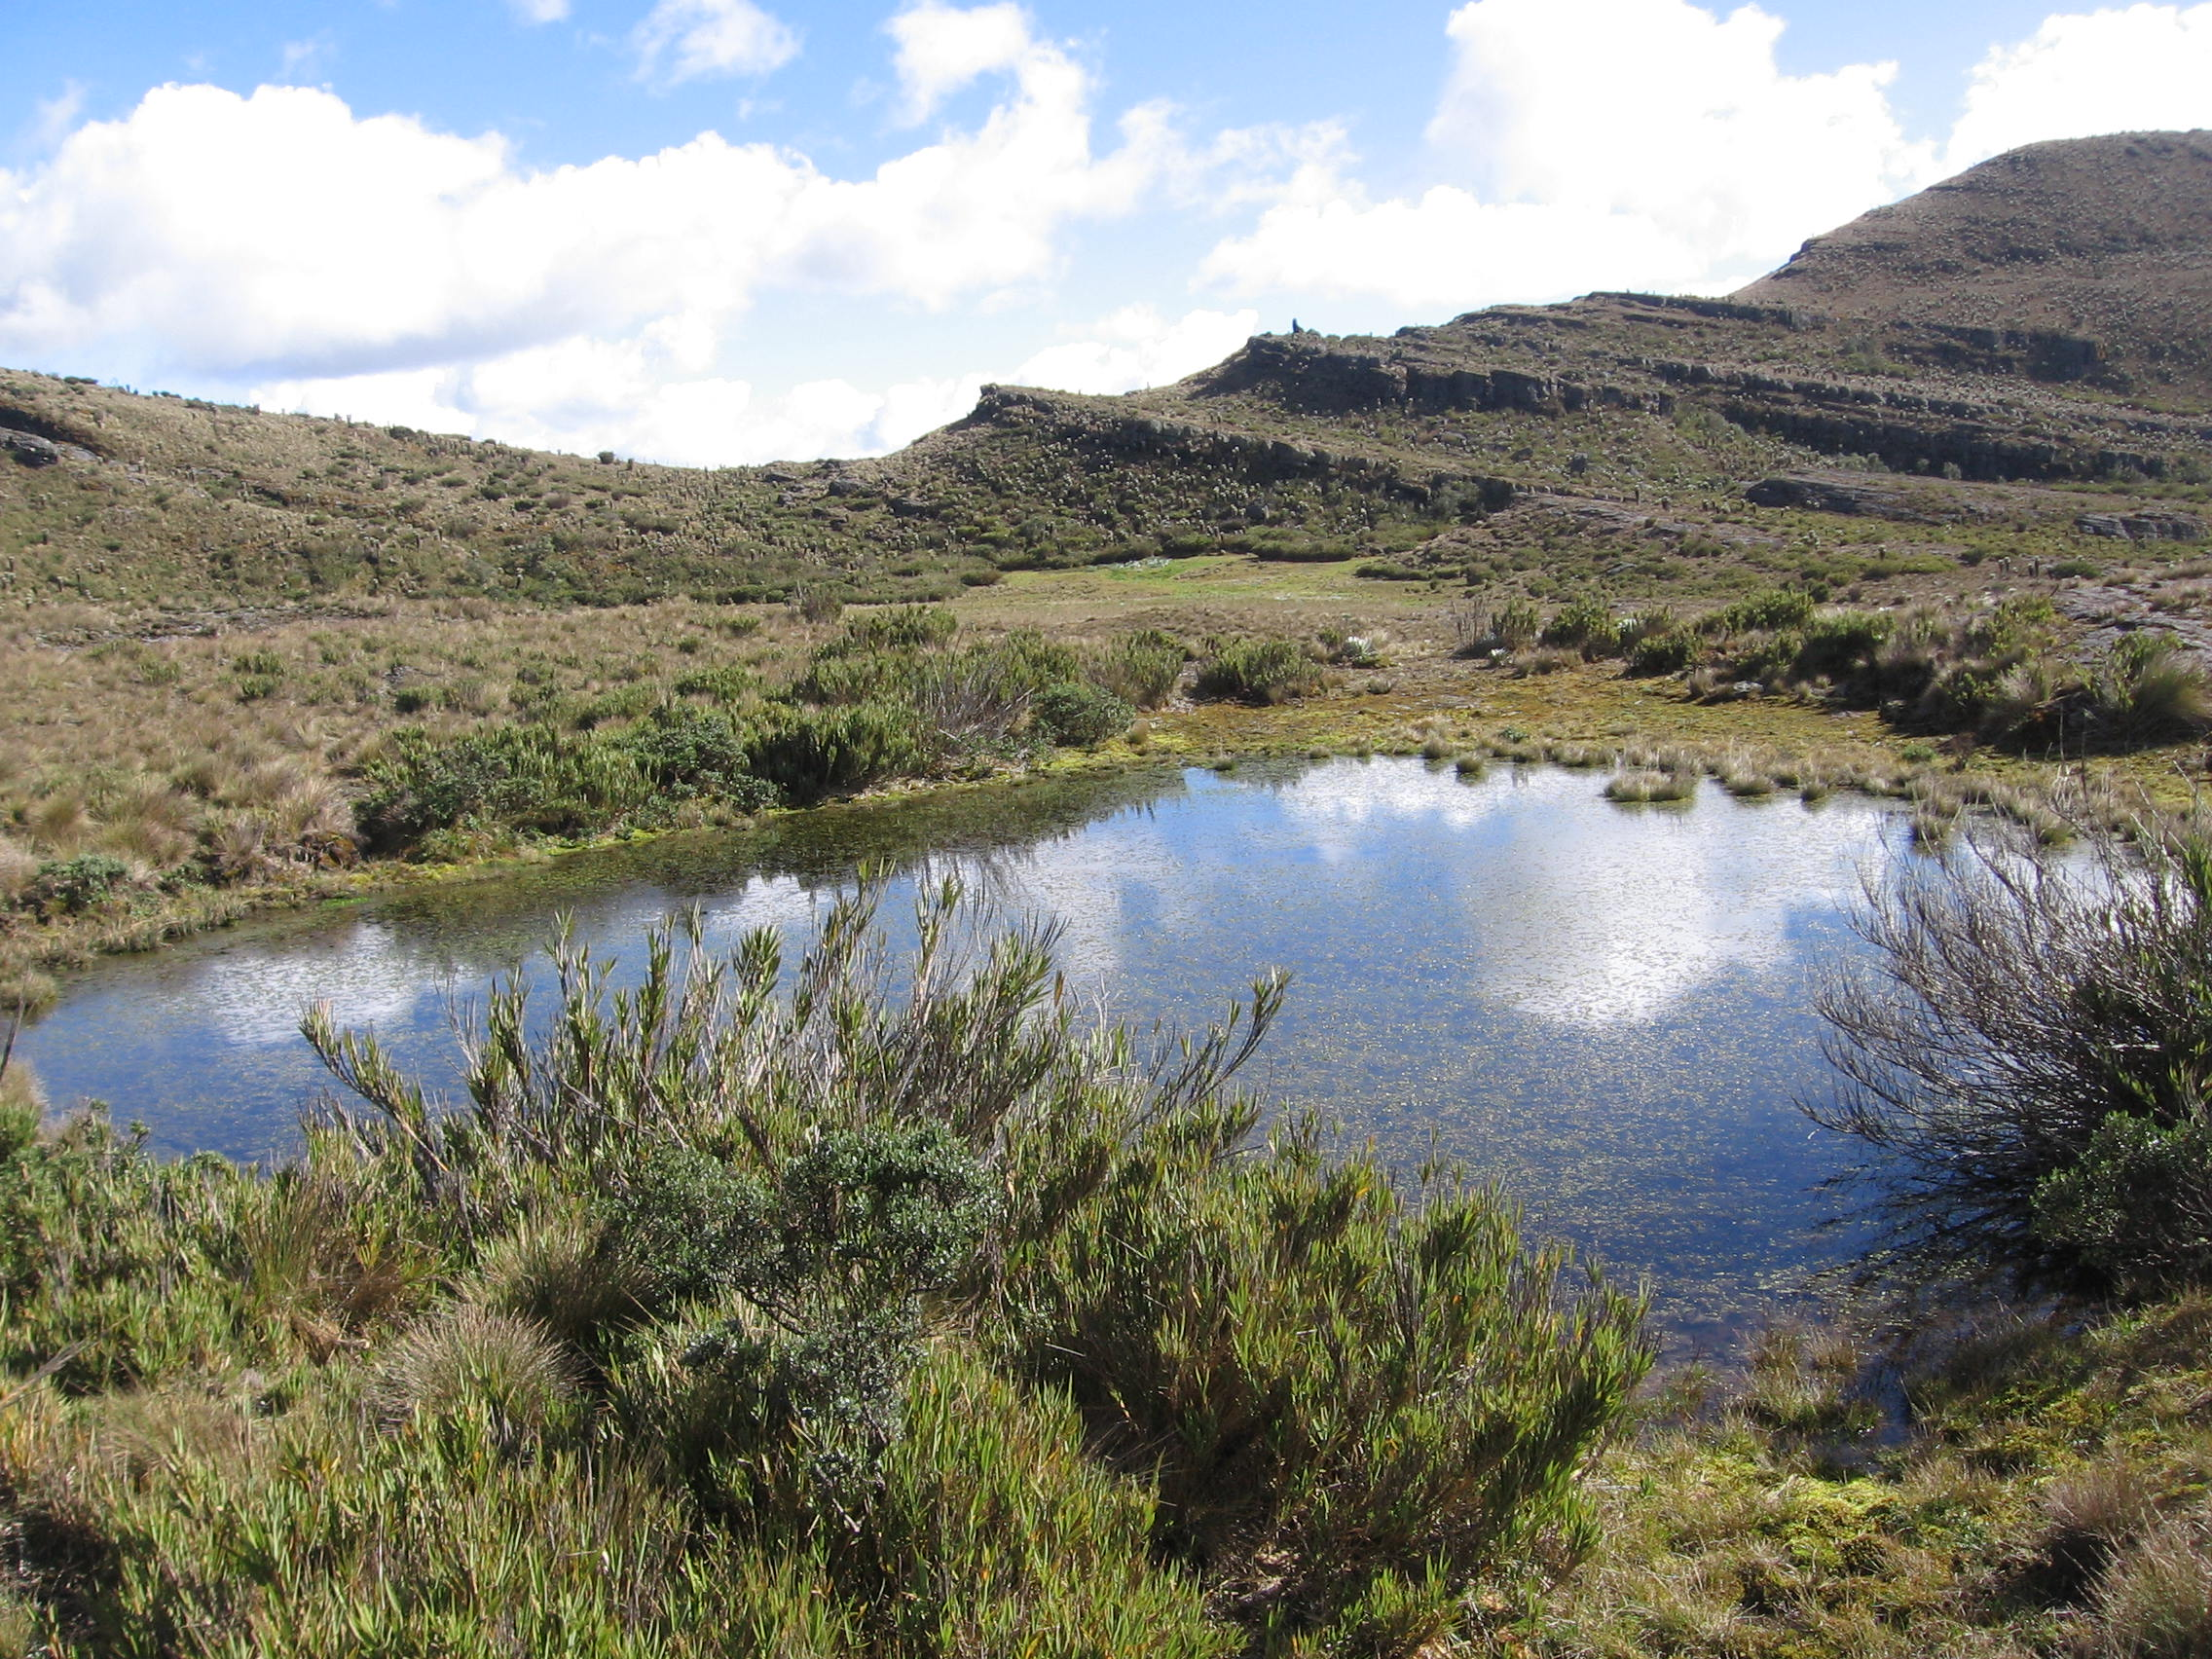 Laguna negraParamo de Oceta - Manuel galvis rueda